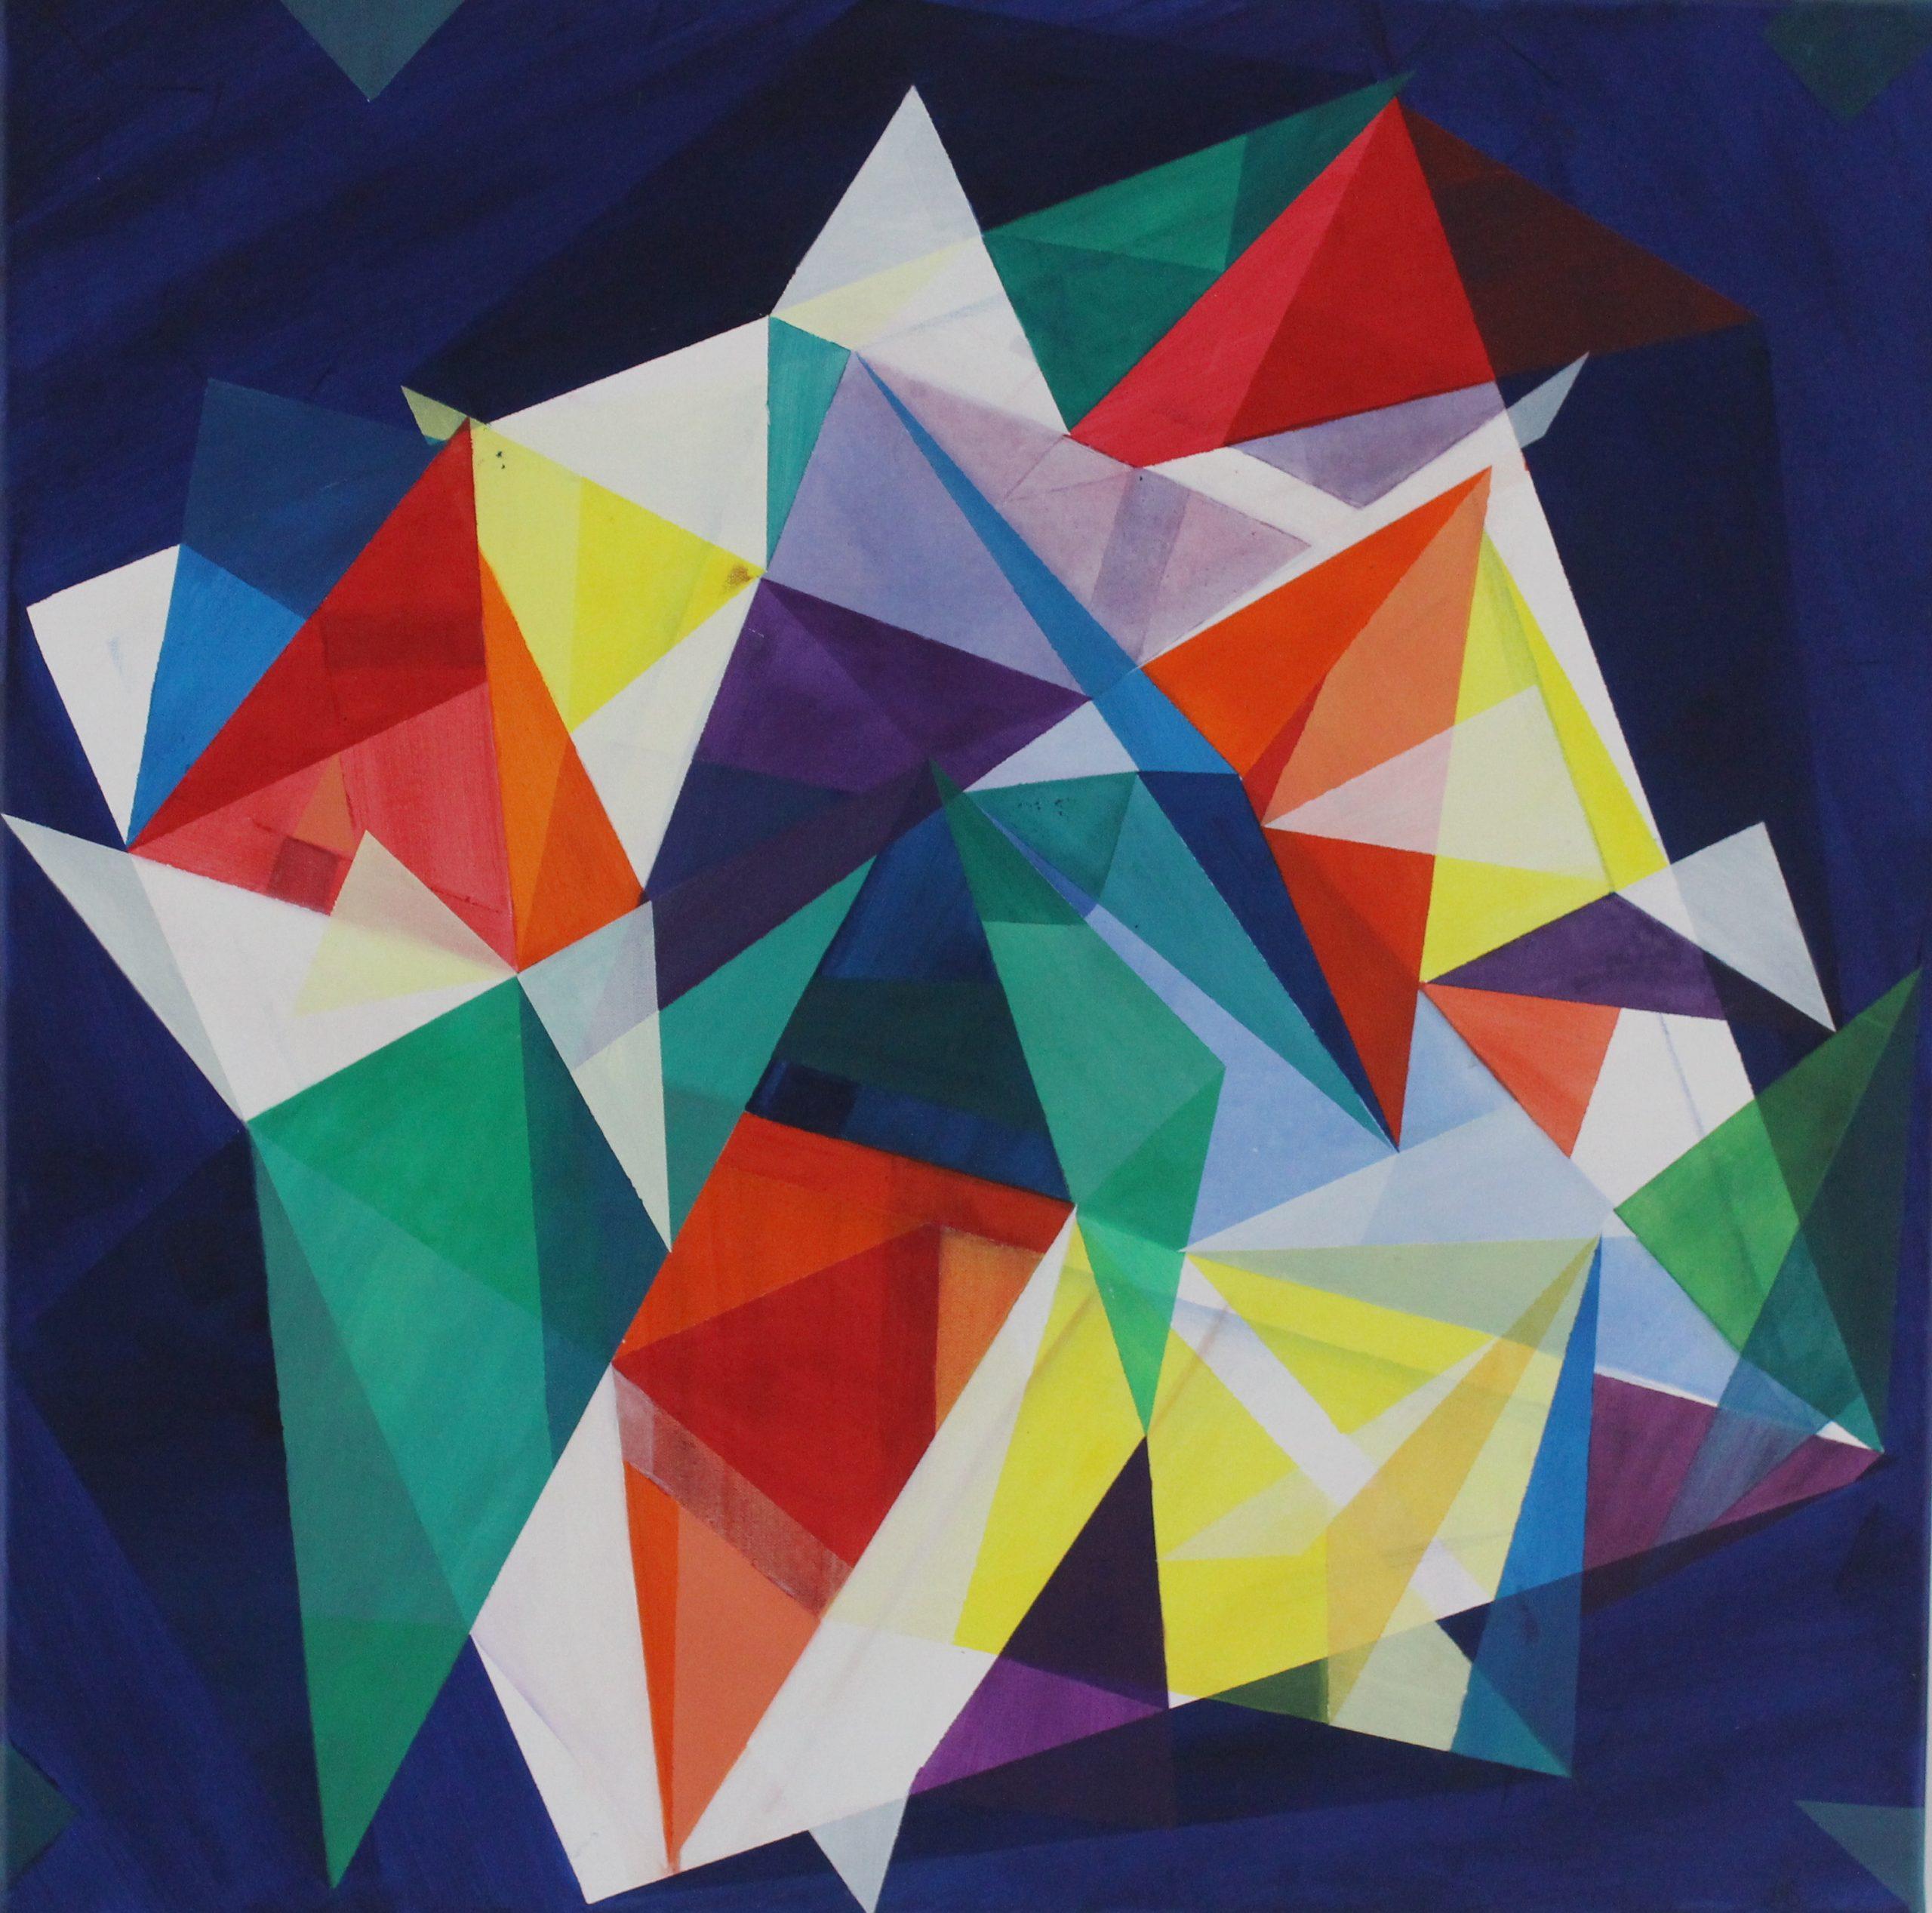 Helen Stevenson - Spectrum- Acrylic on canvas- 80 x 80cm - £300